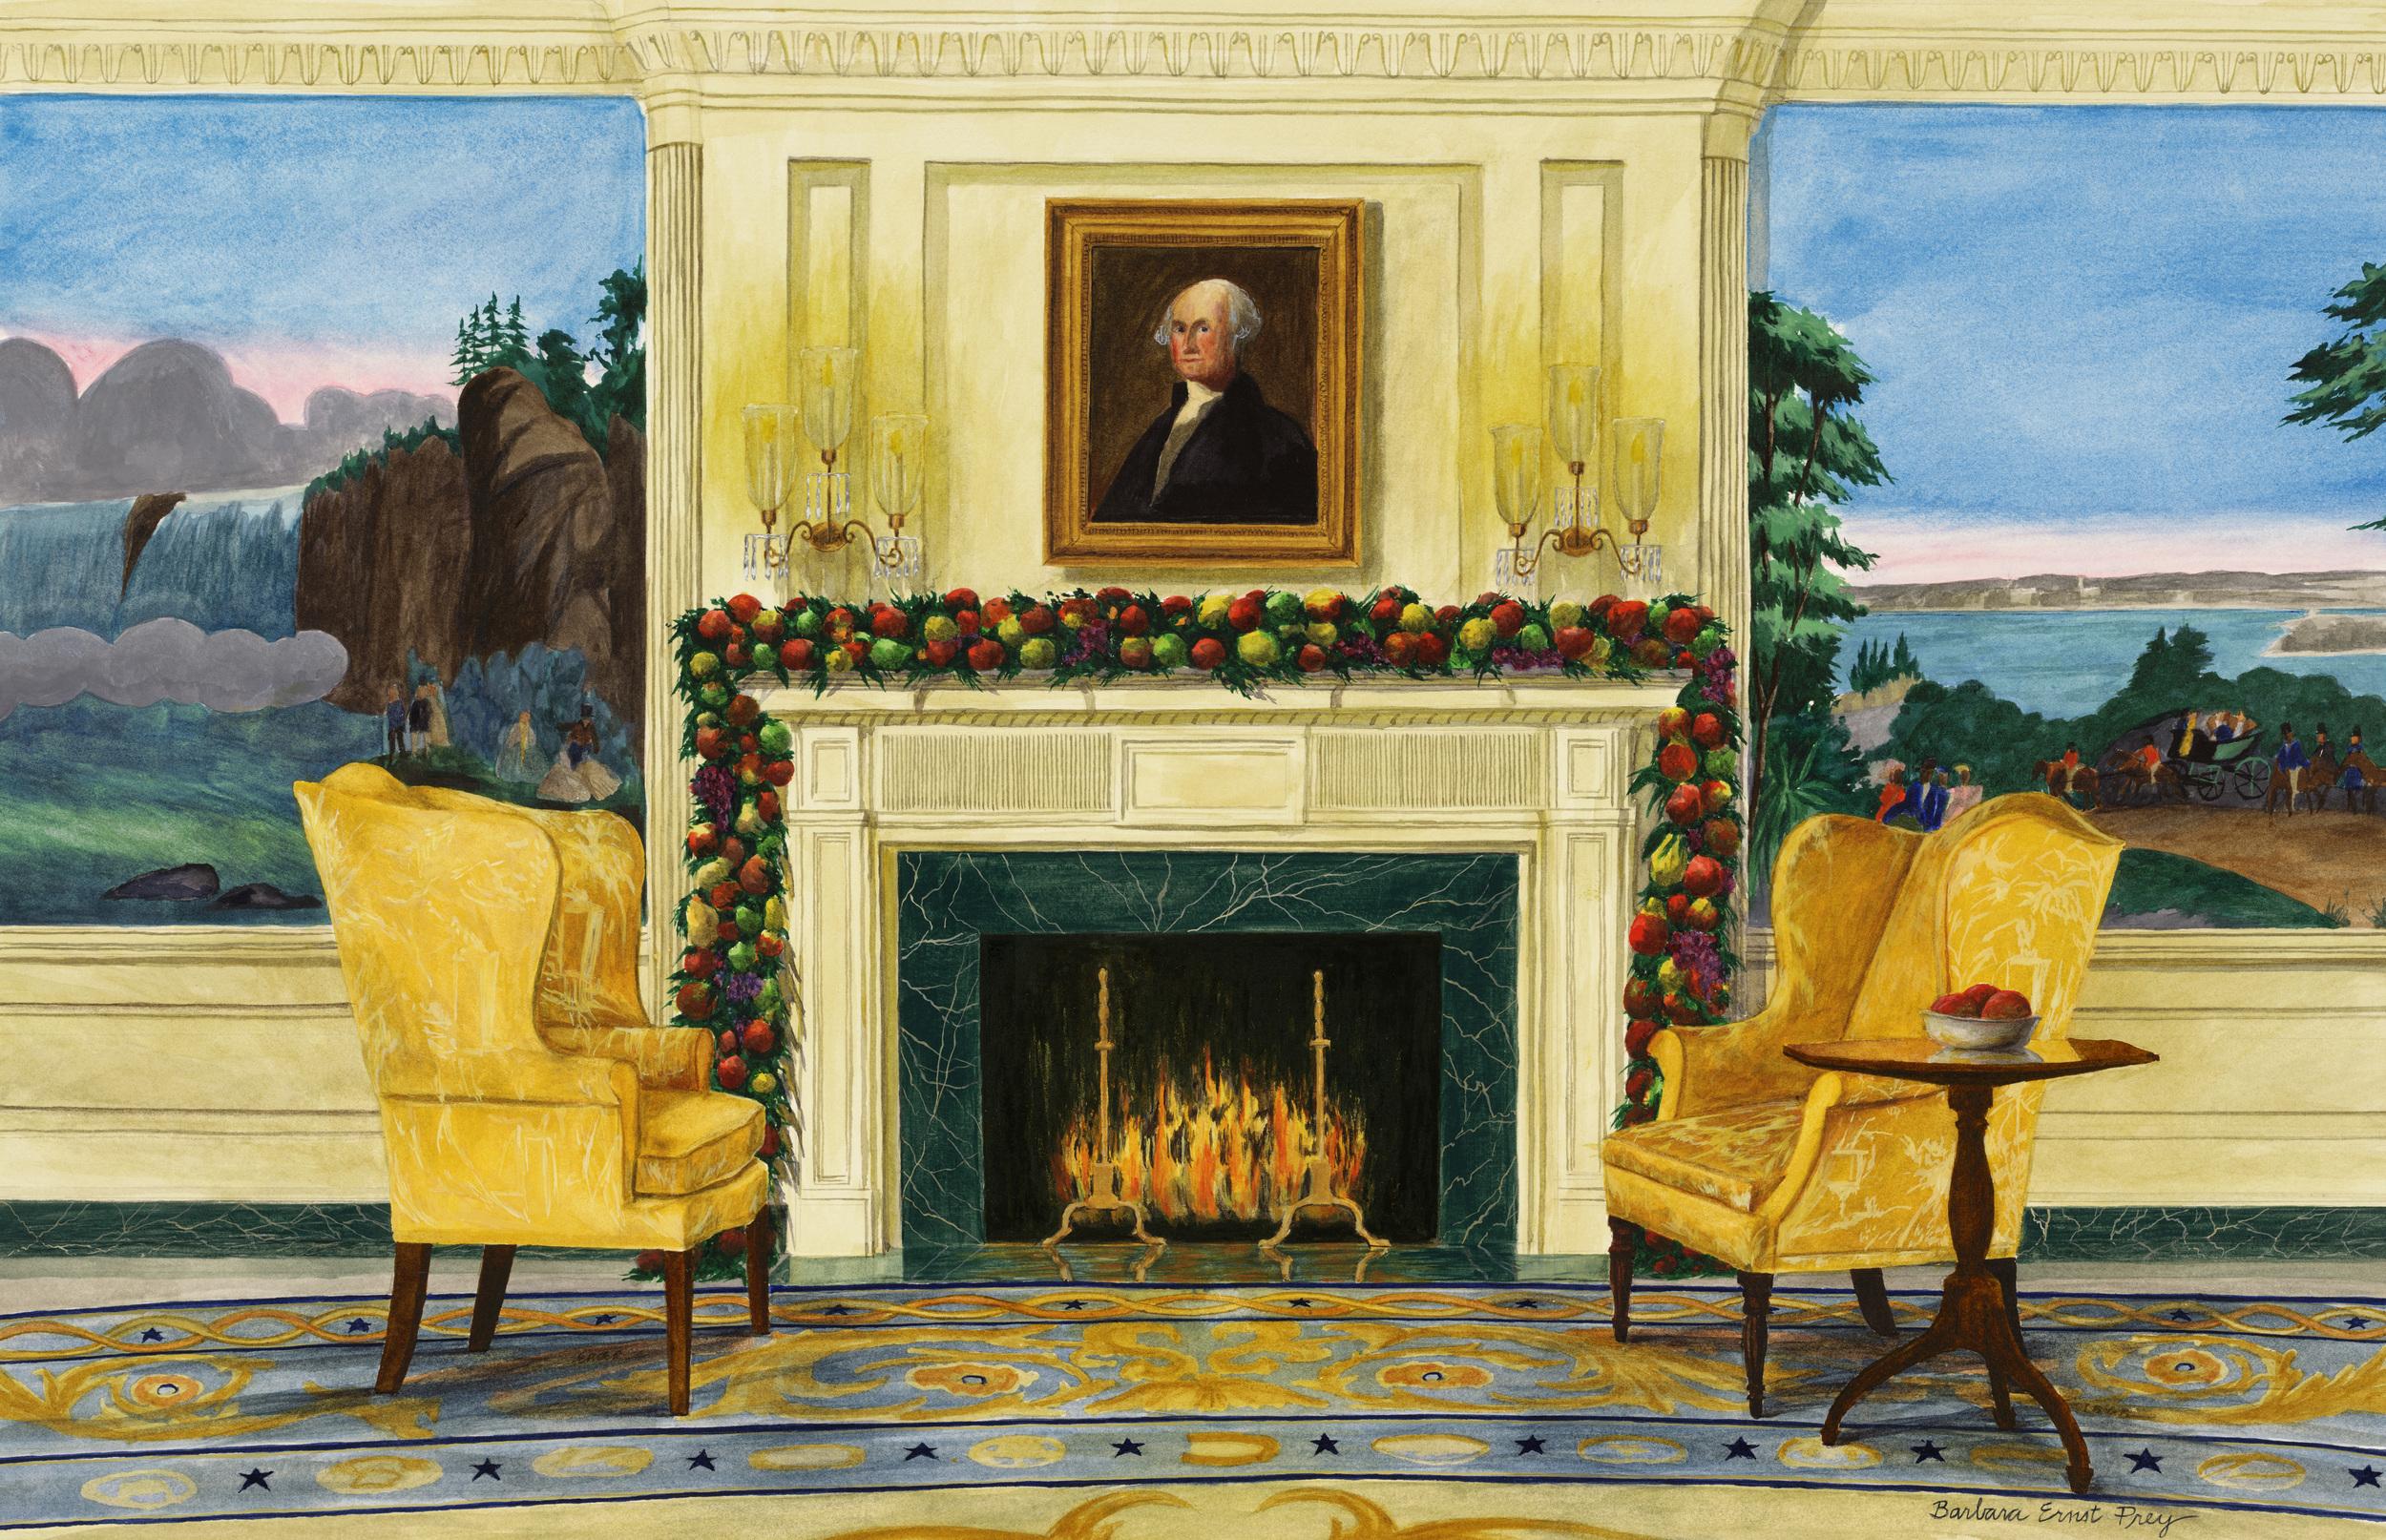 White House Christmas Card.jpg